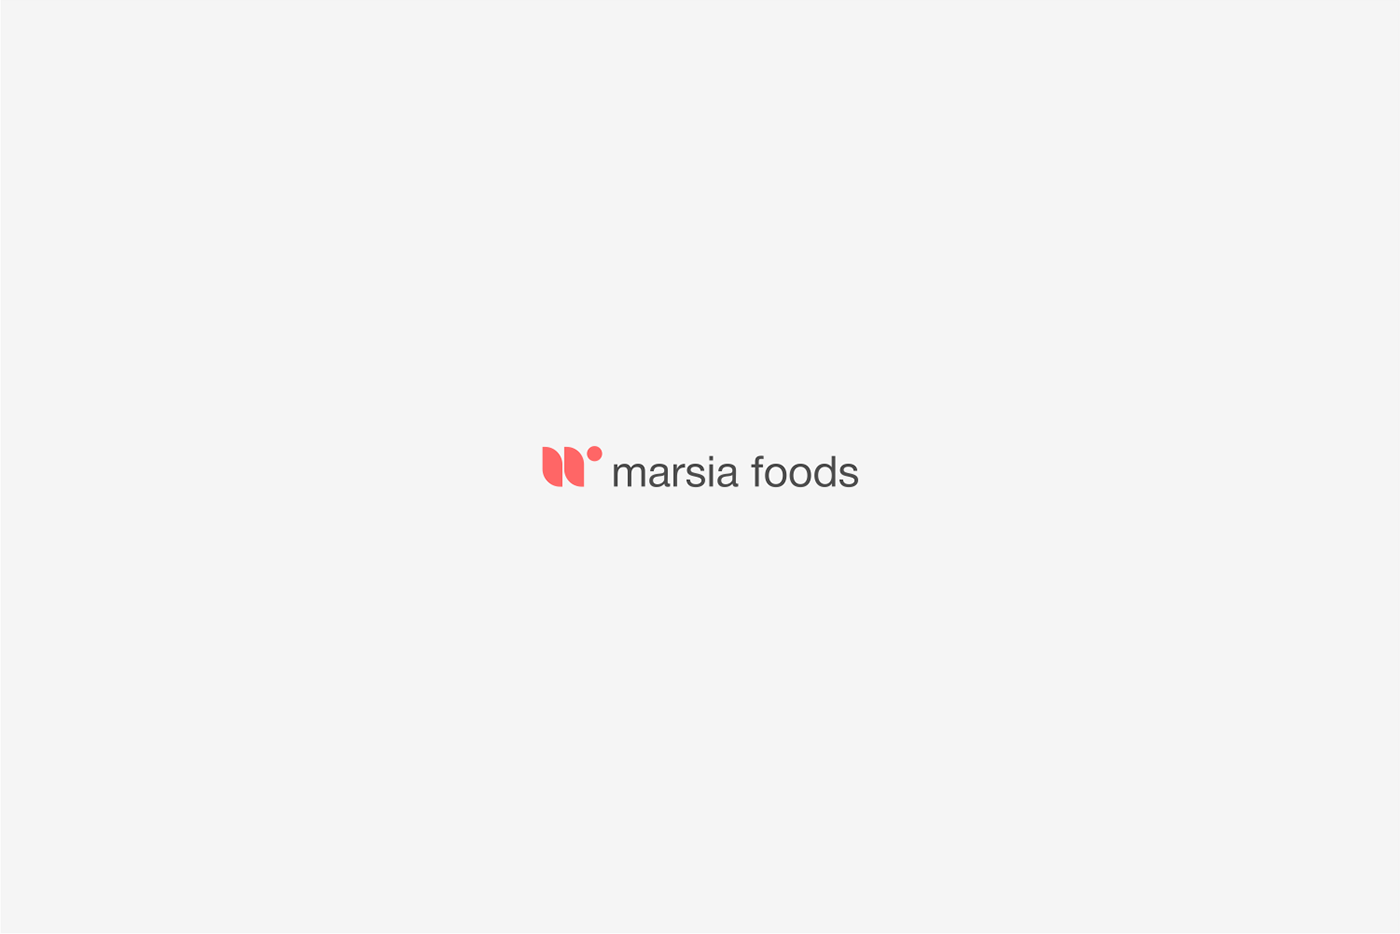 marsia foods dried fruits organic Fruit Food  juice nuts Canada